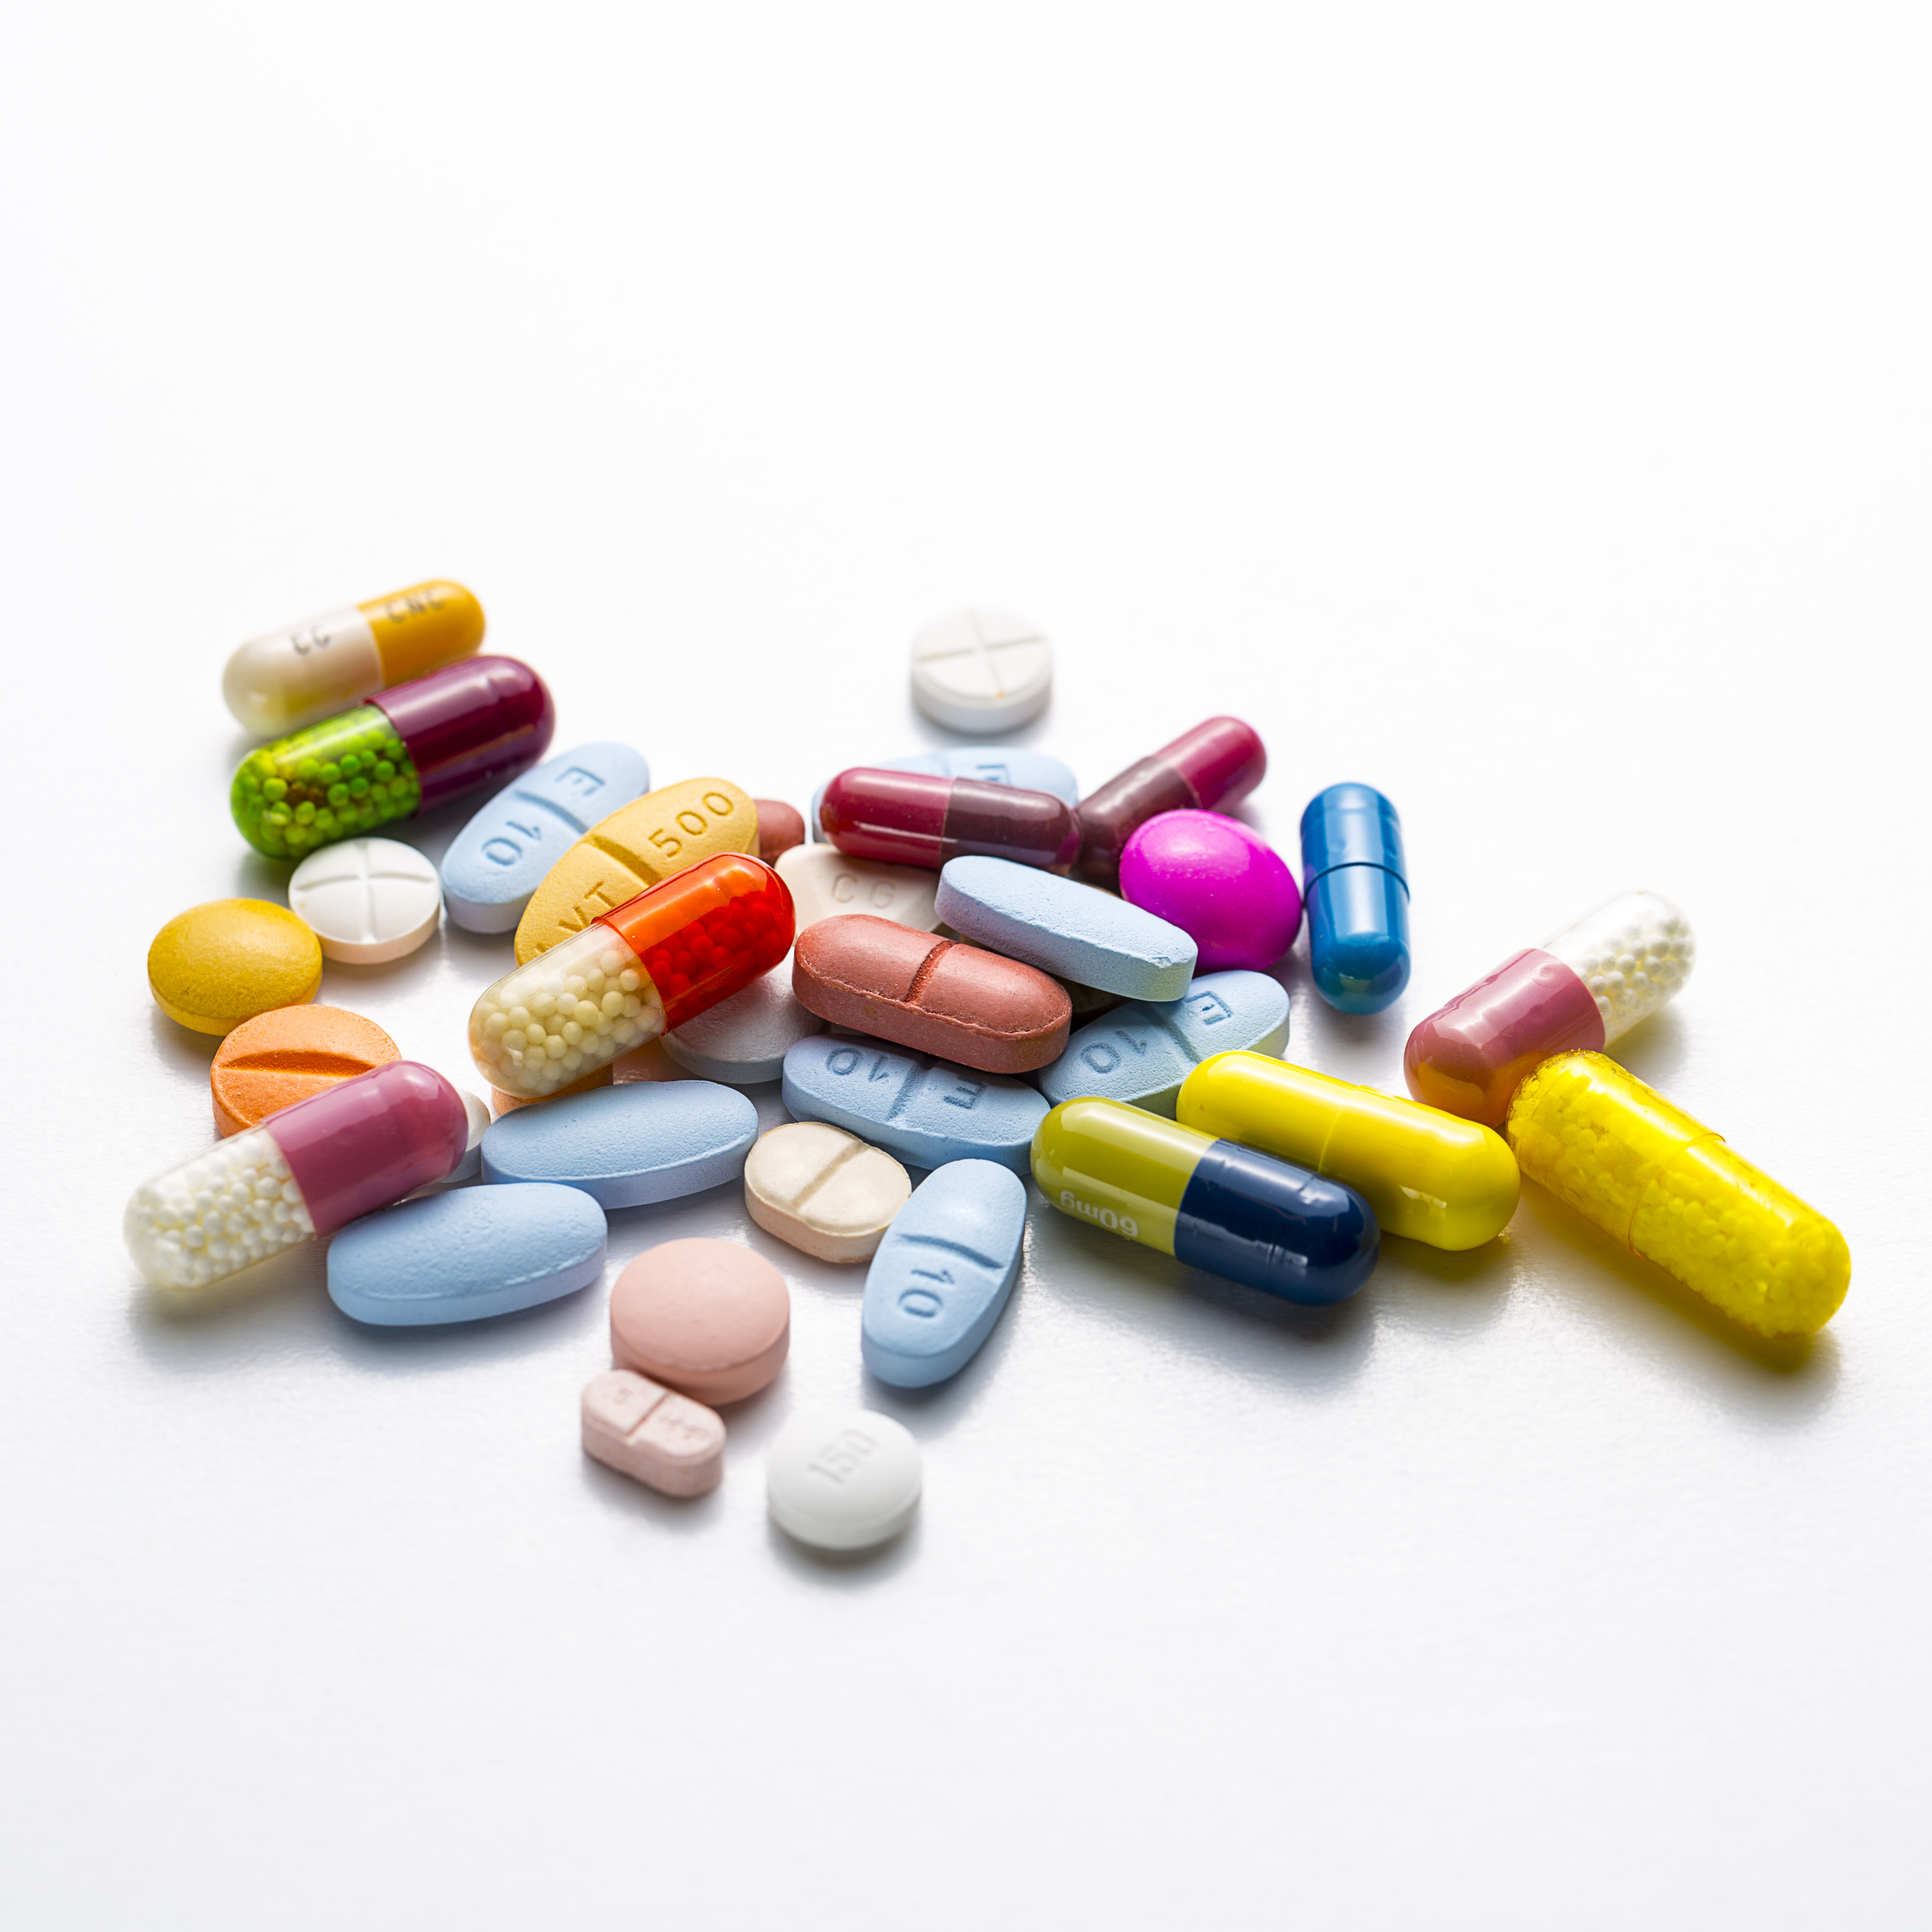 adhd medicin vuxna biverkningar